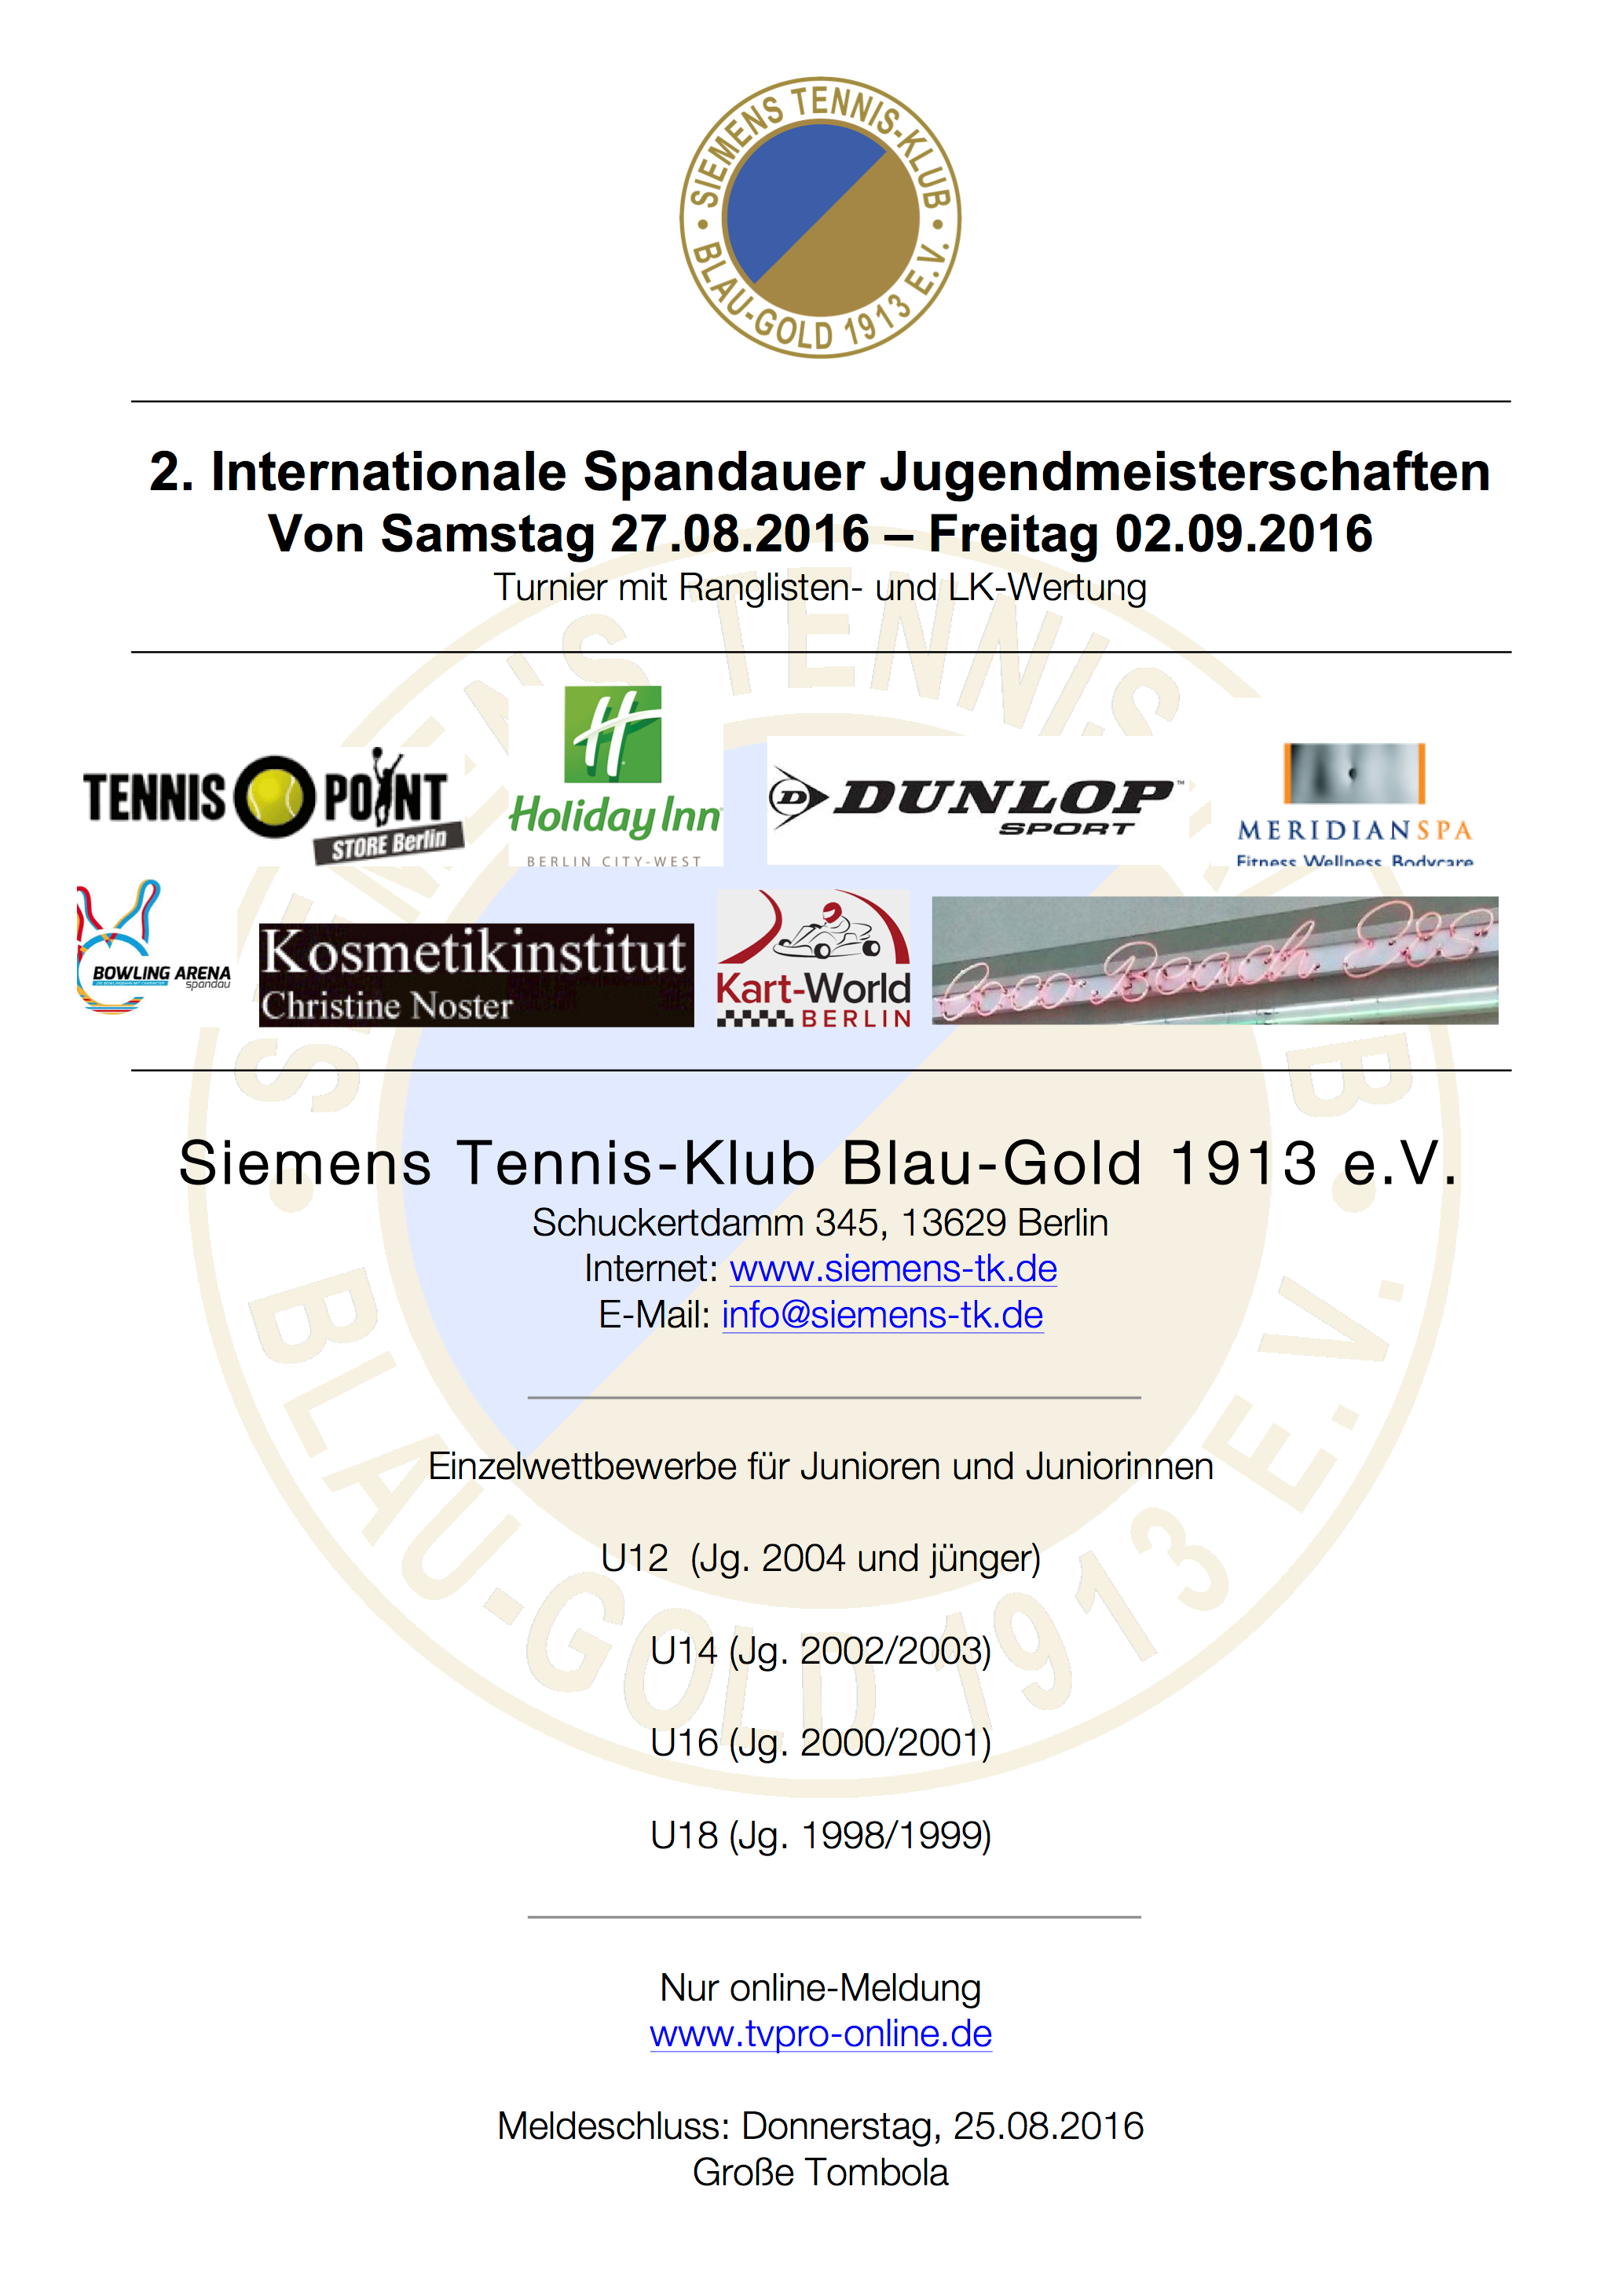 2. Internationale Spandauer Jugendmeisterschaften 2016